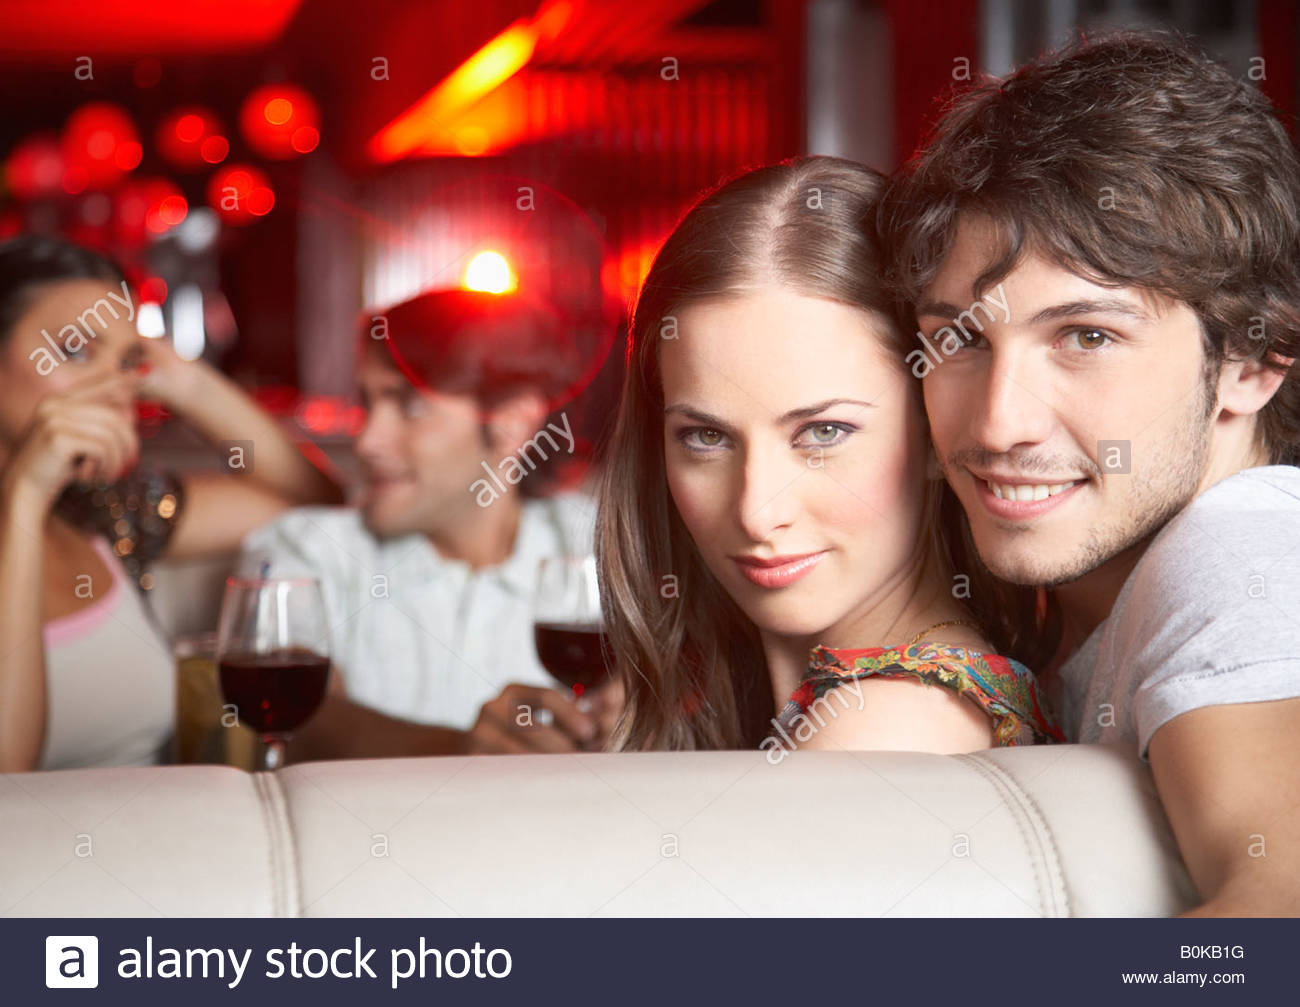 Giovane seduti insieme in stand al nightclub sorridente Immagini Stock